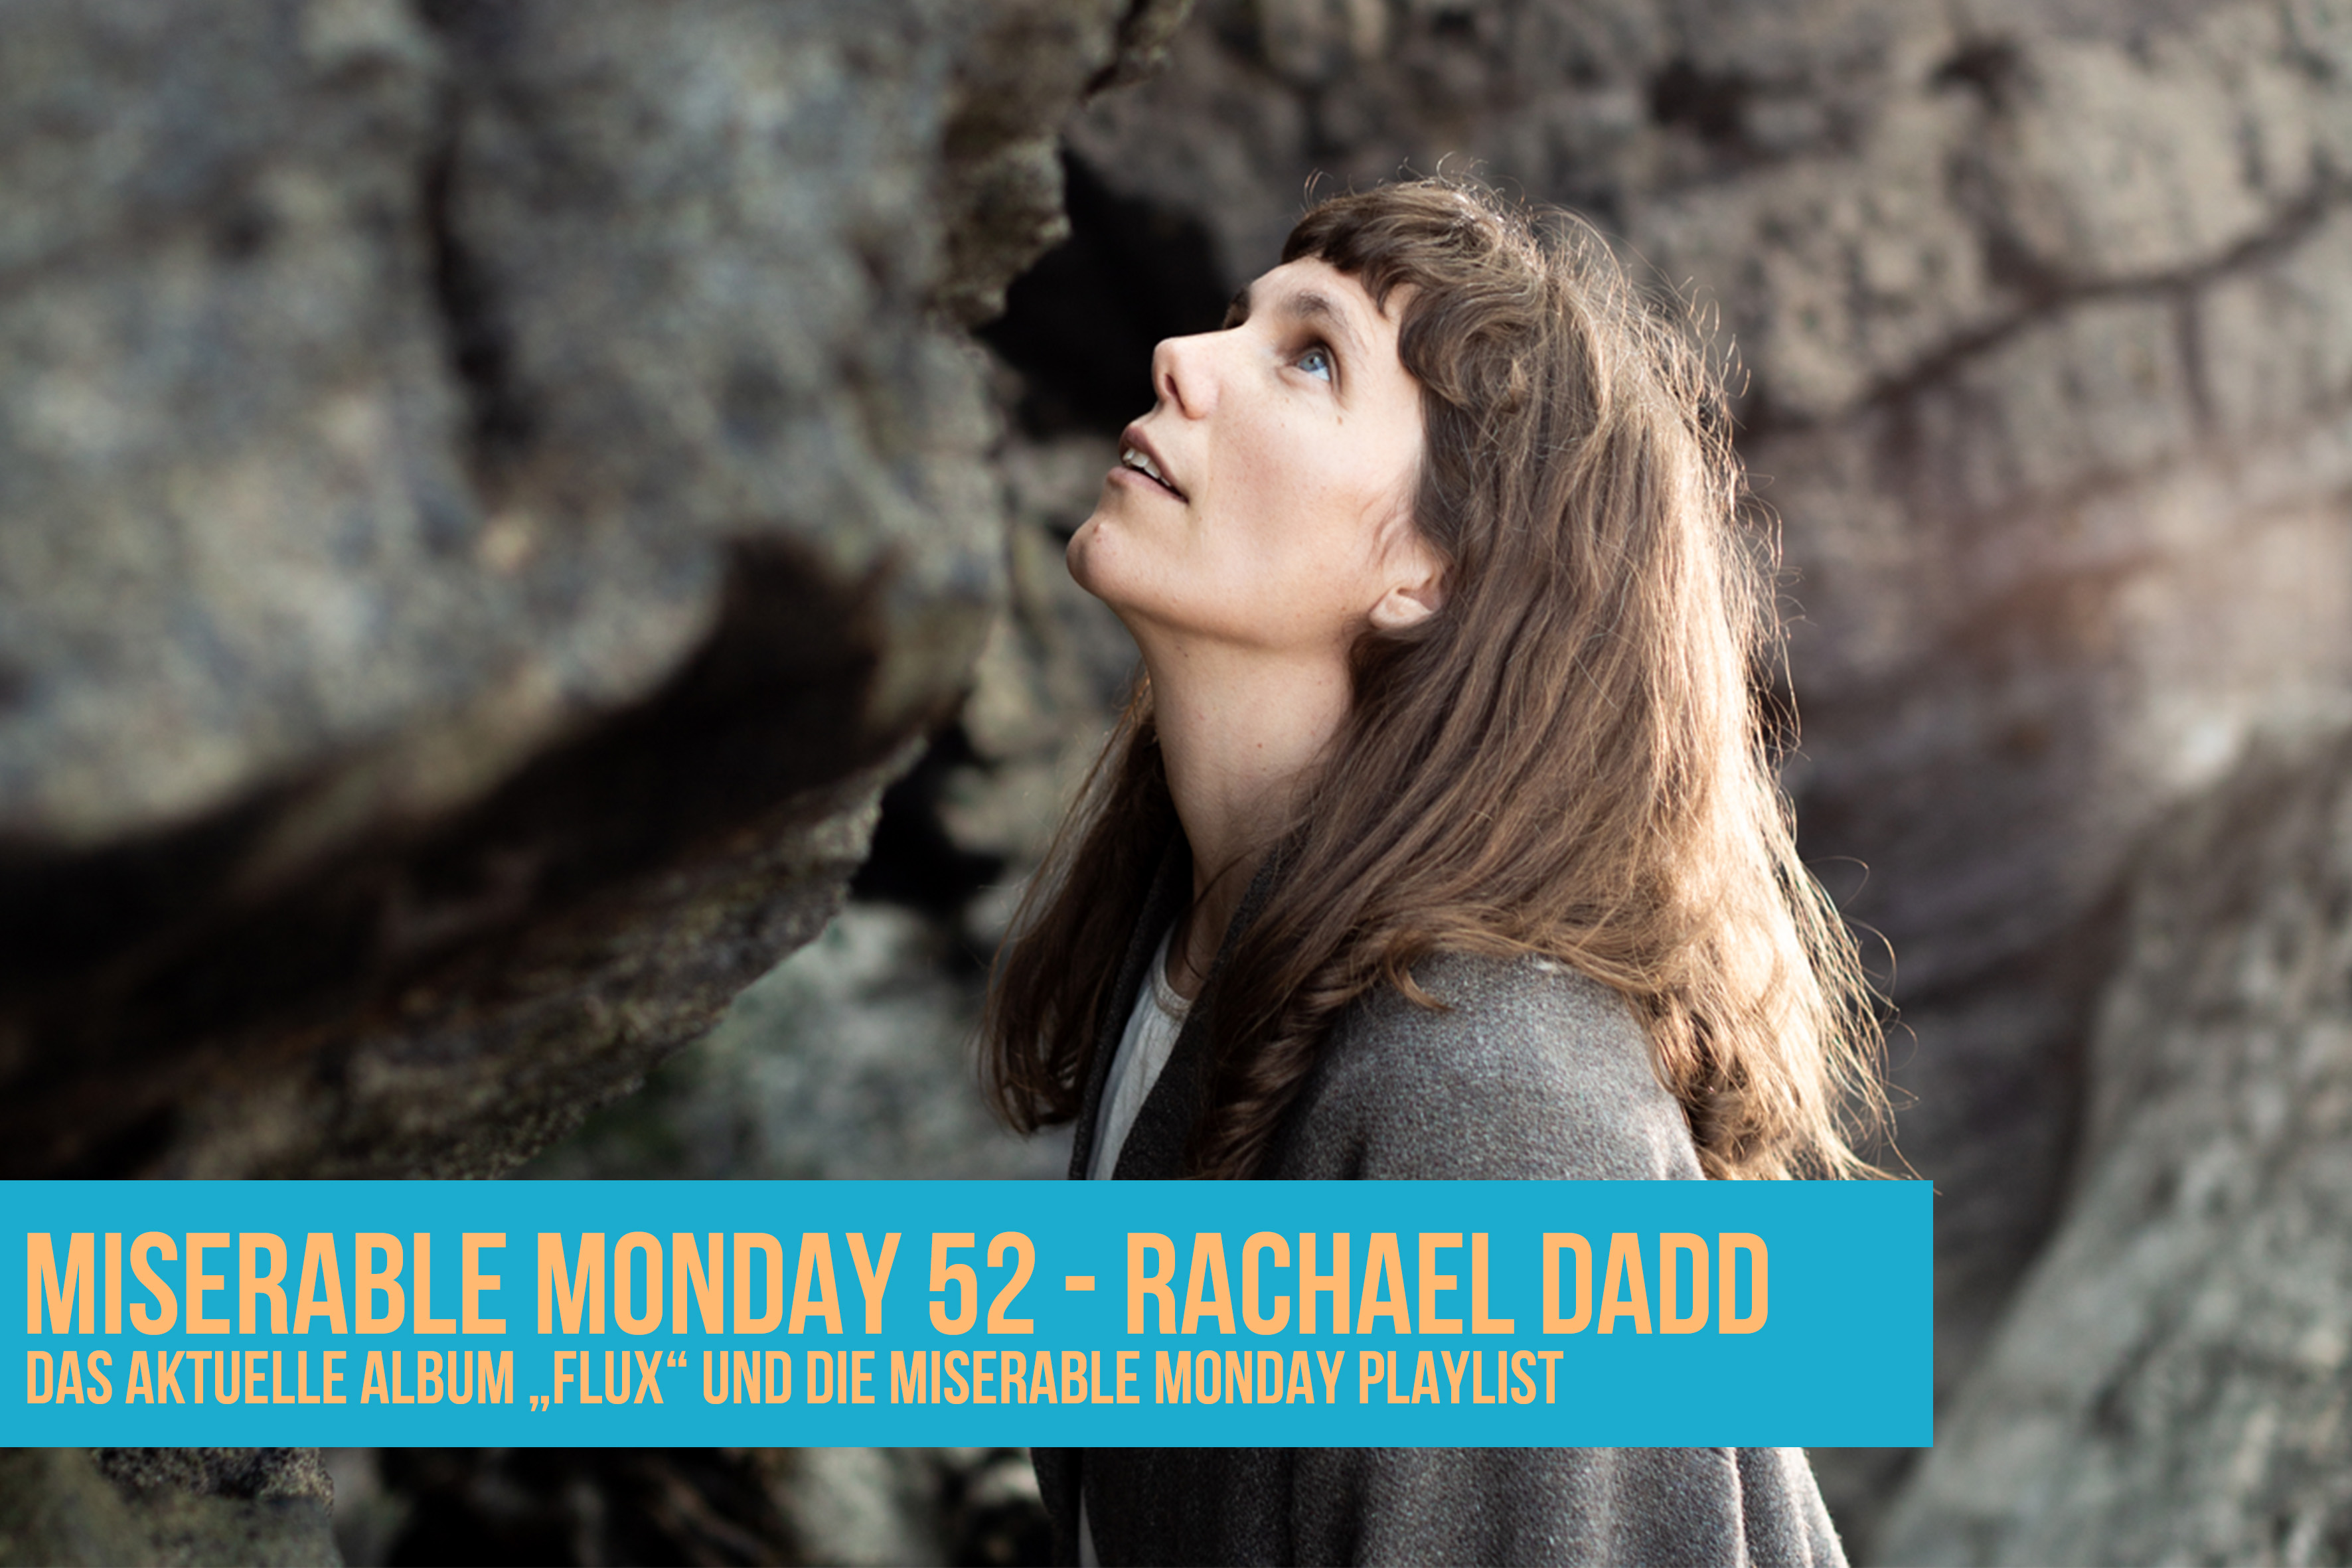 52 - Rachael Dadd